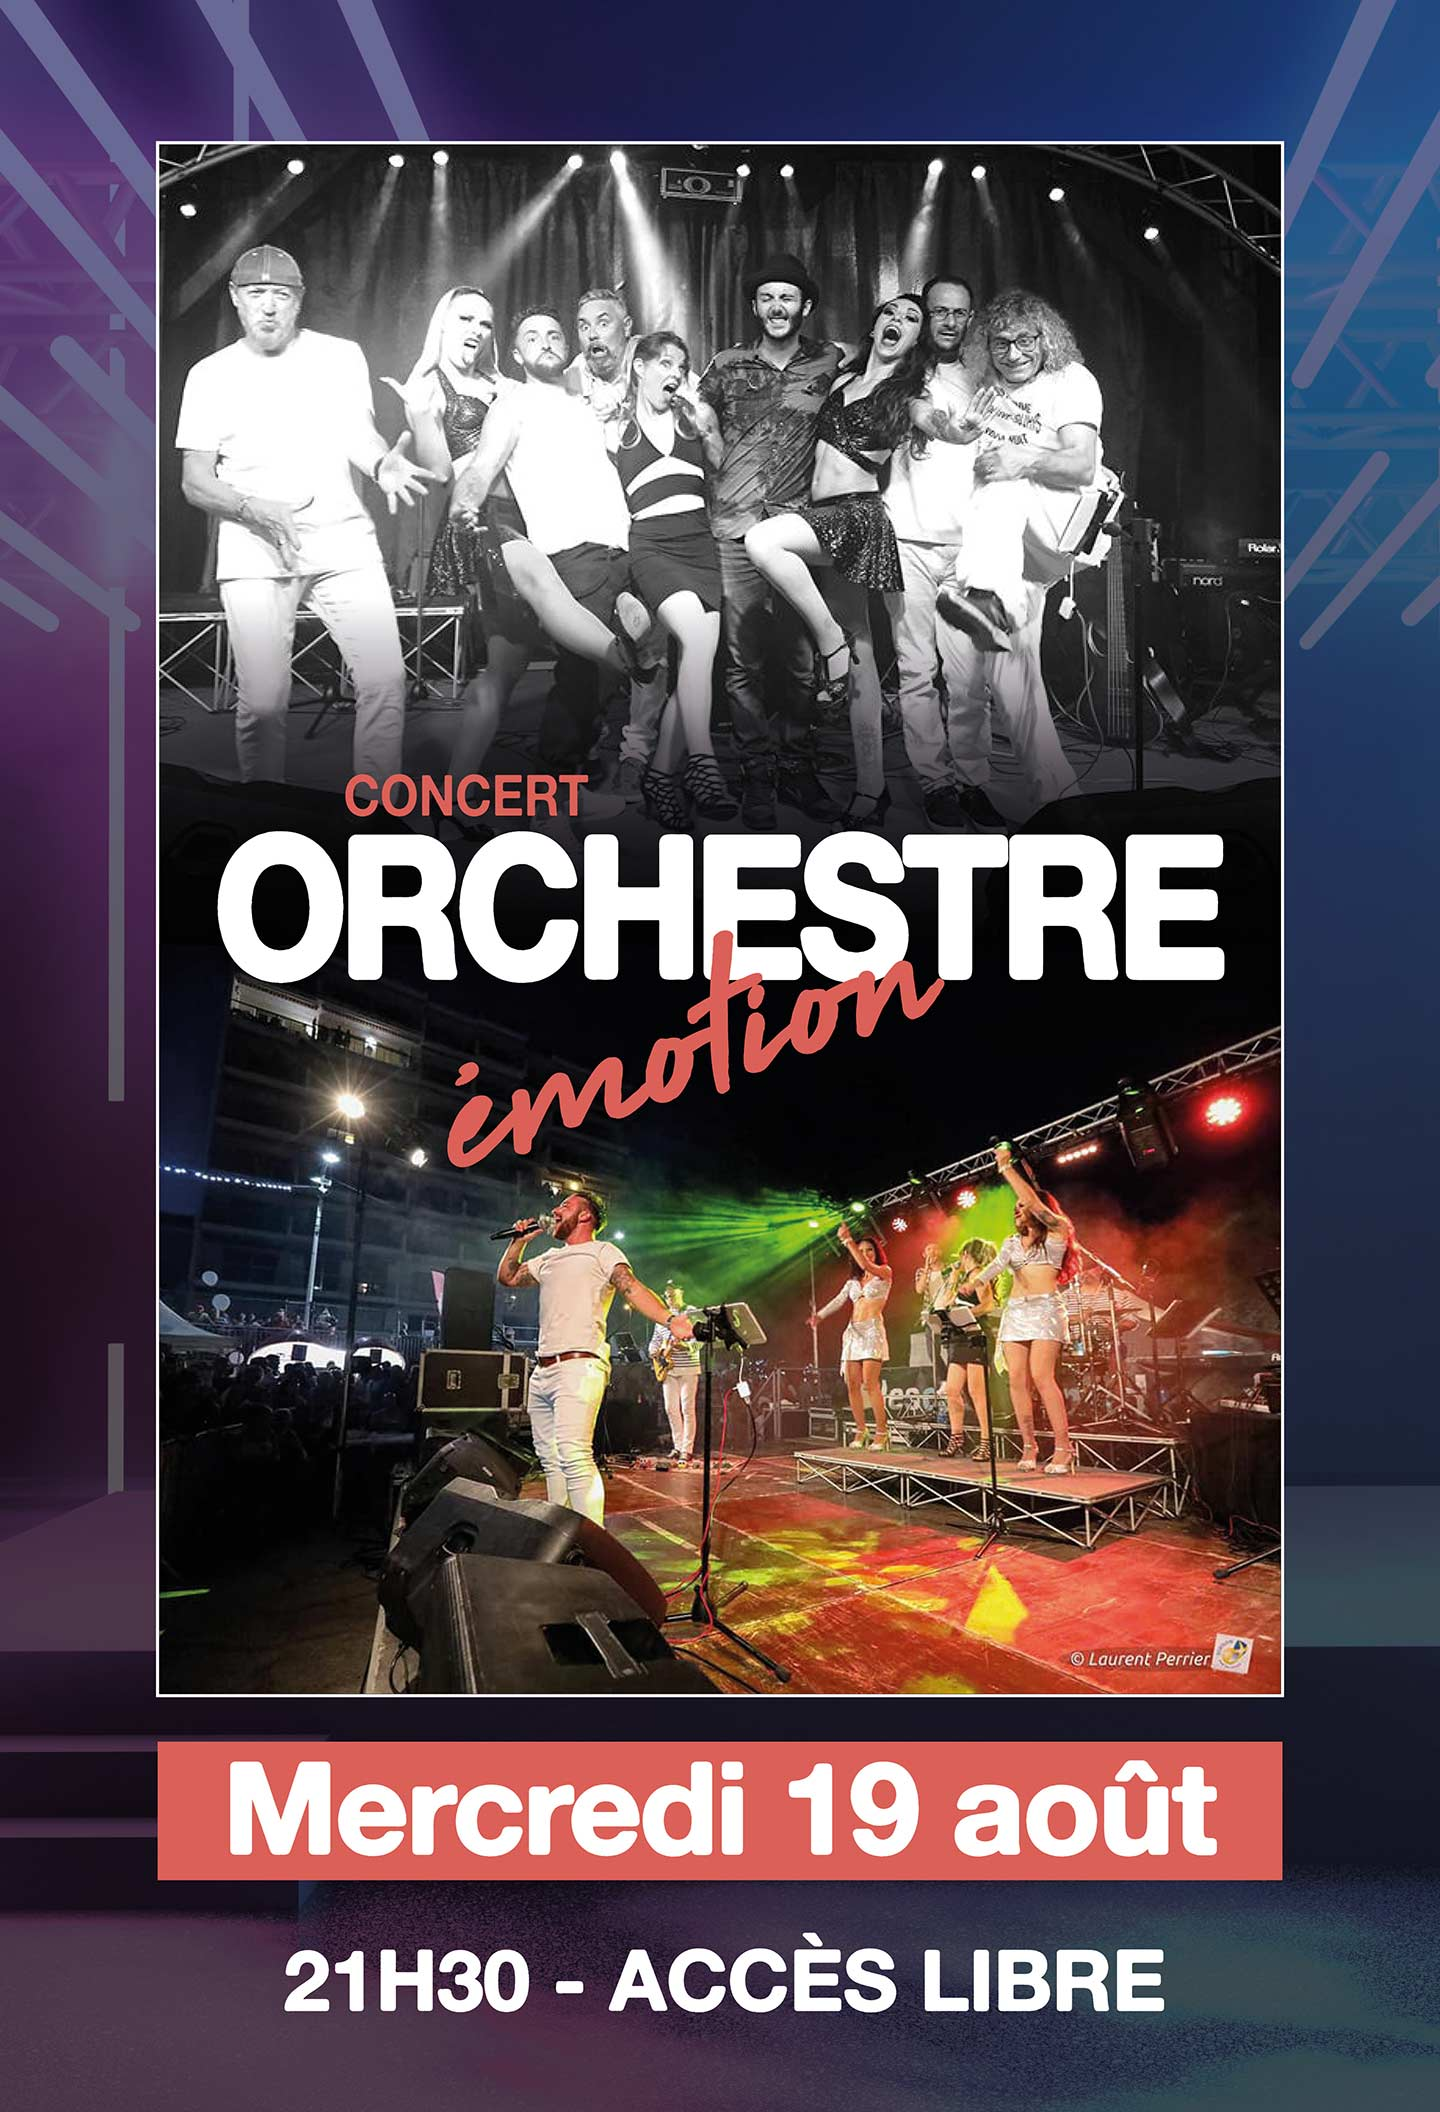 Orchestre Emotion 2